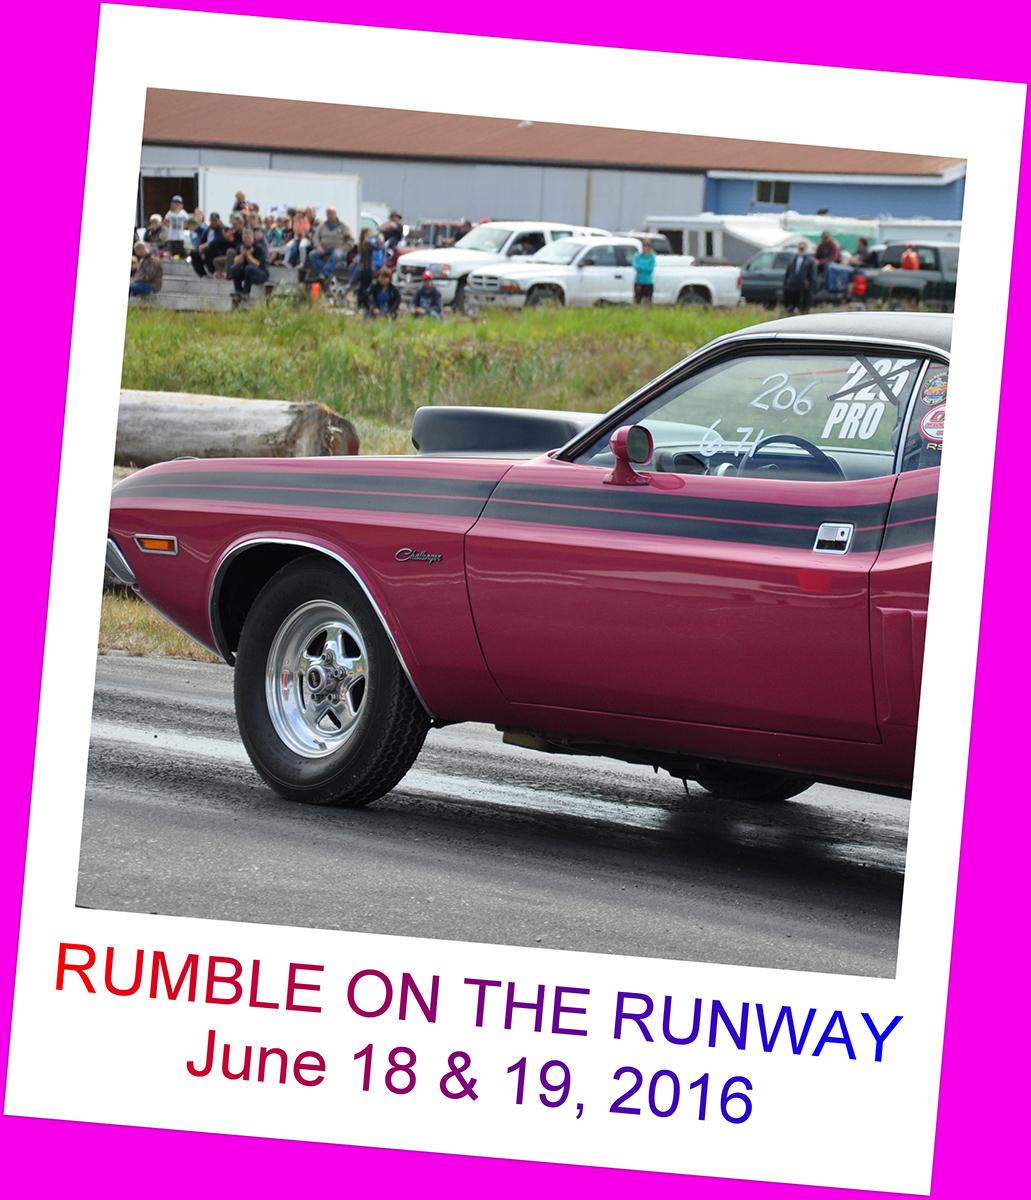 Rumble on the Runway June 18 & 19, 2016 665